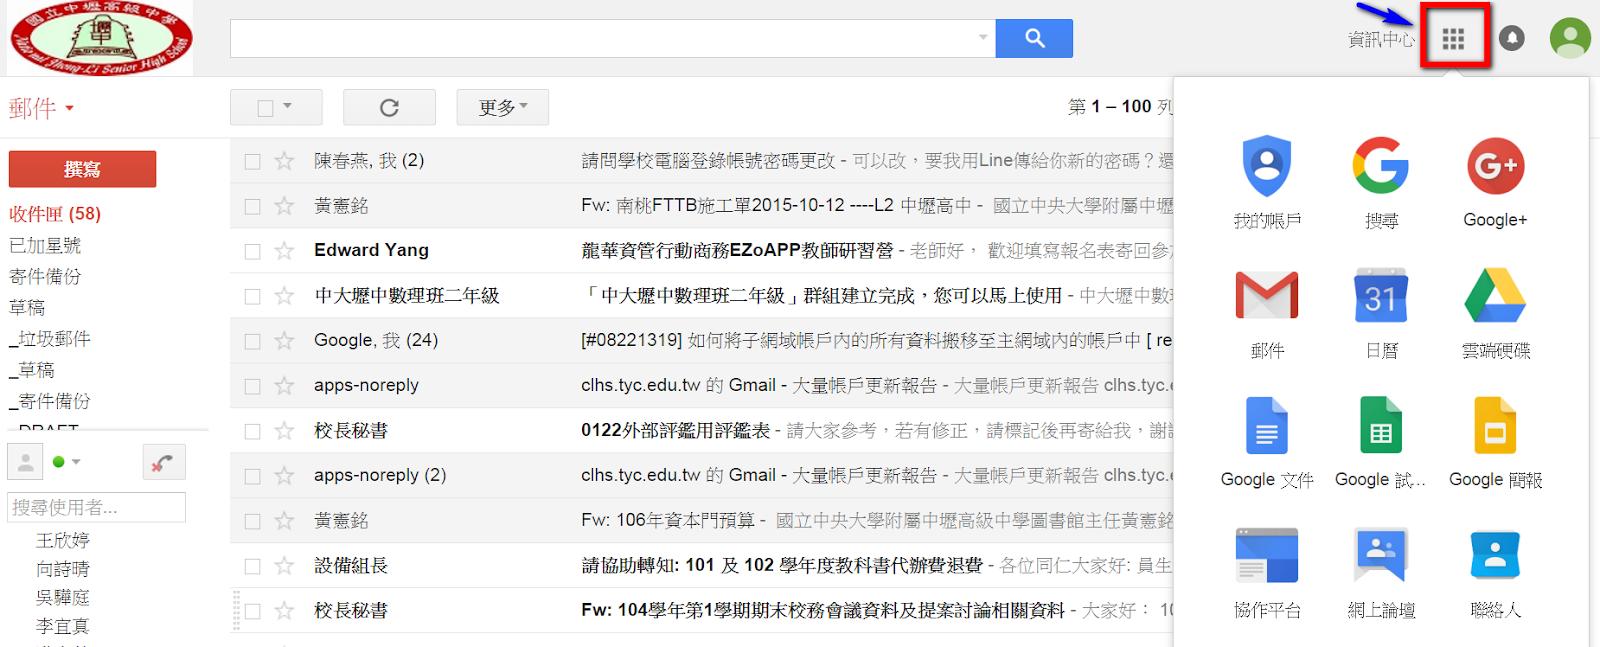 5_Google Apps.png